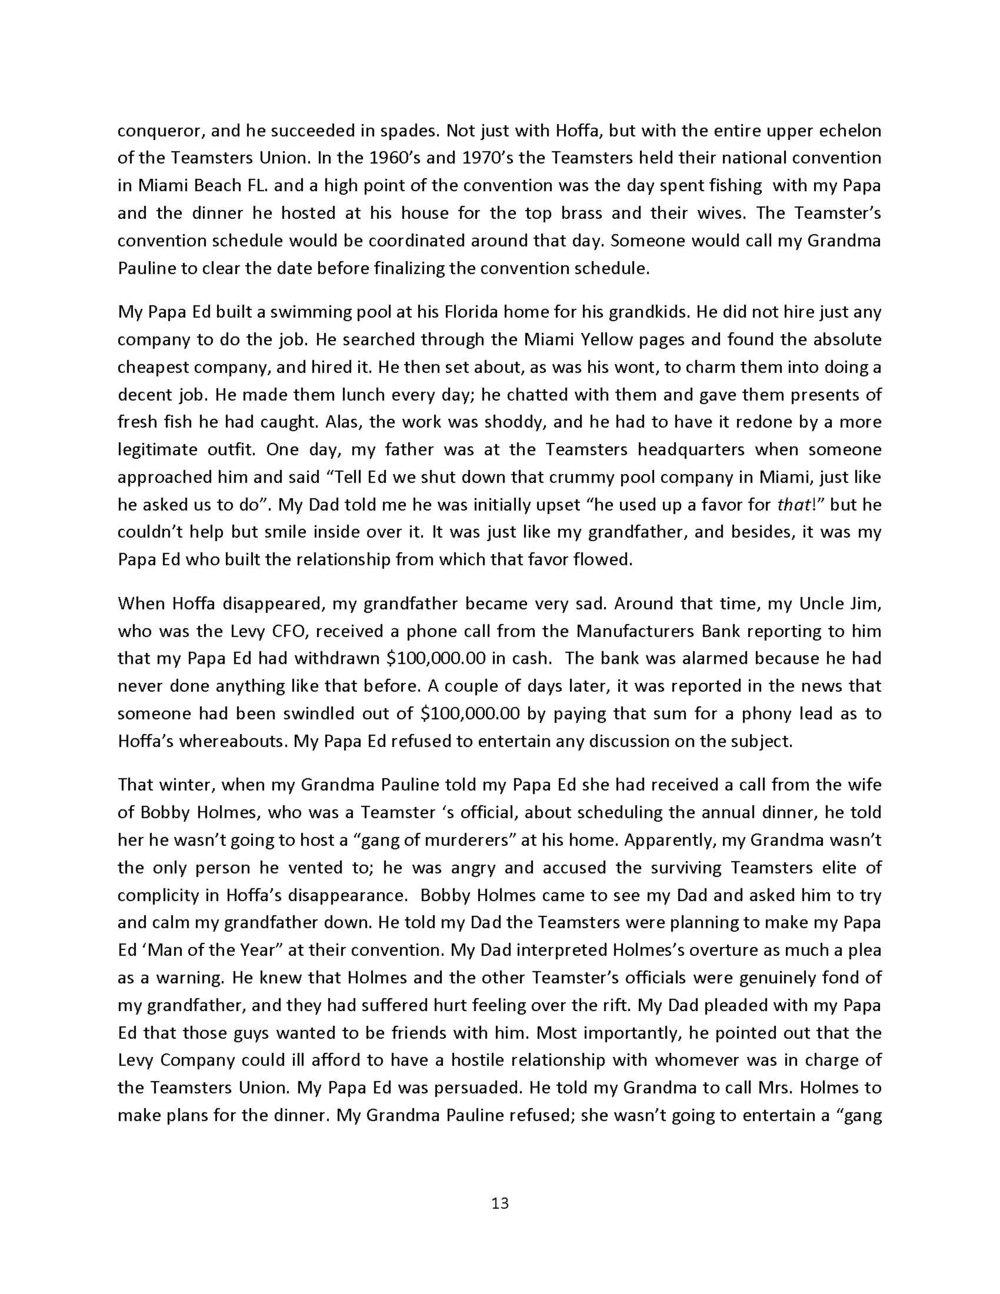 Papa Ed Stories -excerpts_Page_13.jpg